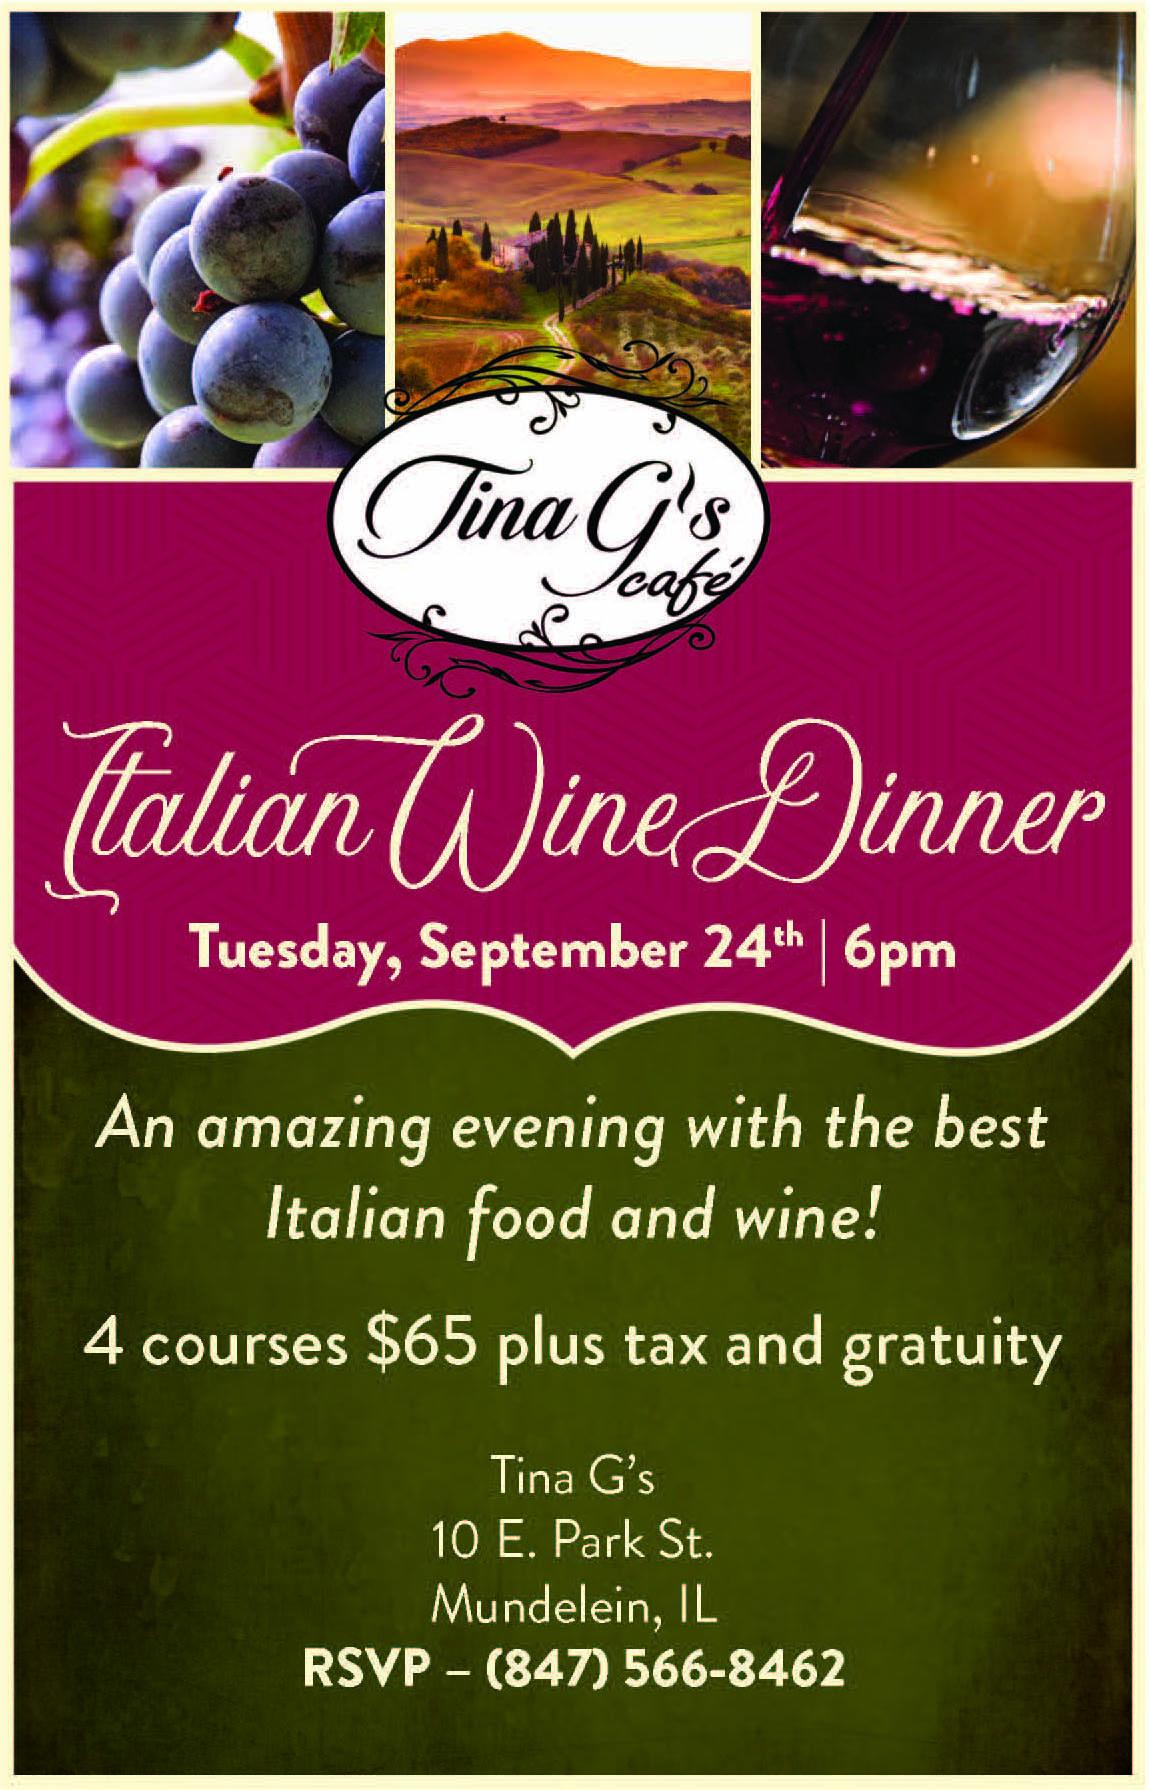 Tina G's Italian Wine Dinner TT 08 19.jpg